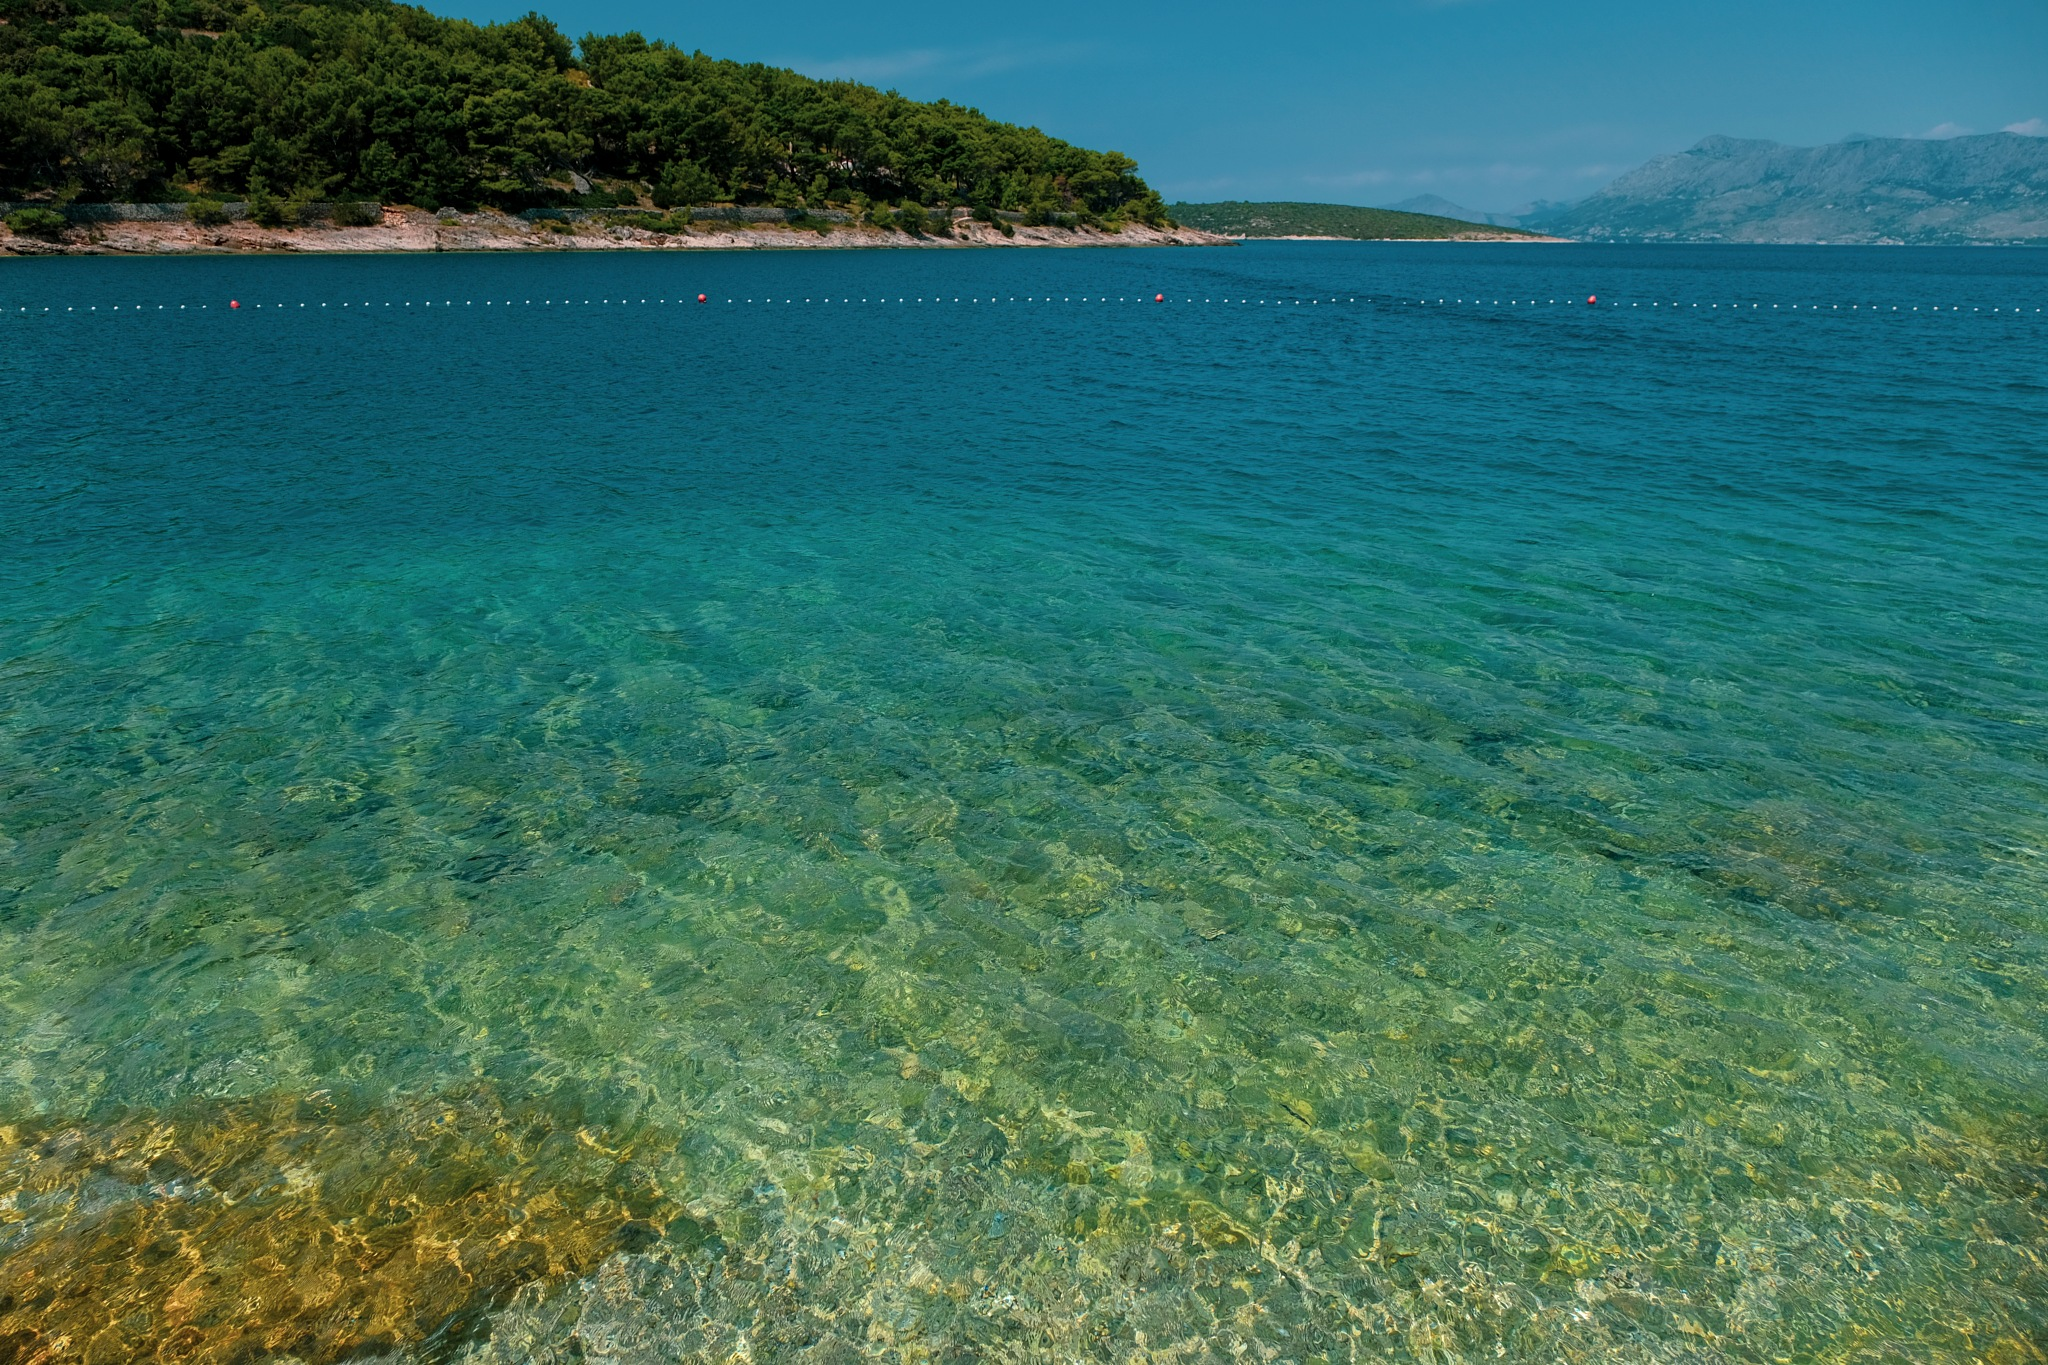 Summer in Croatia : BRAC ISLAND by Goran Jorganovich